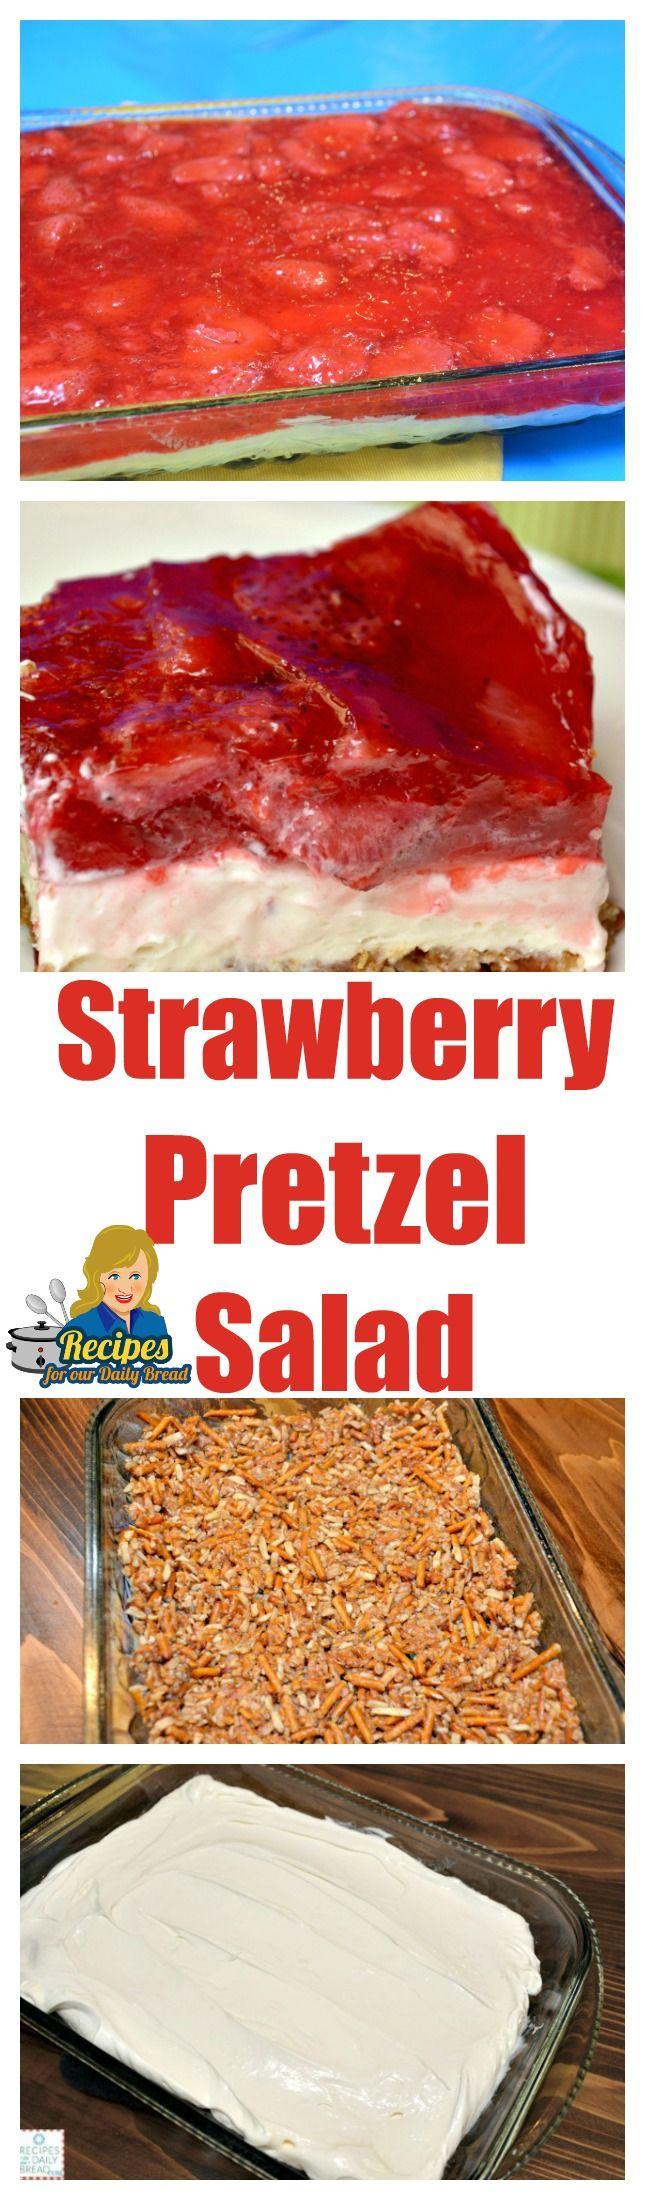 STRAWBERRY PRETZEL SALAD PERFECT SWEET SALTY COMBINATION